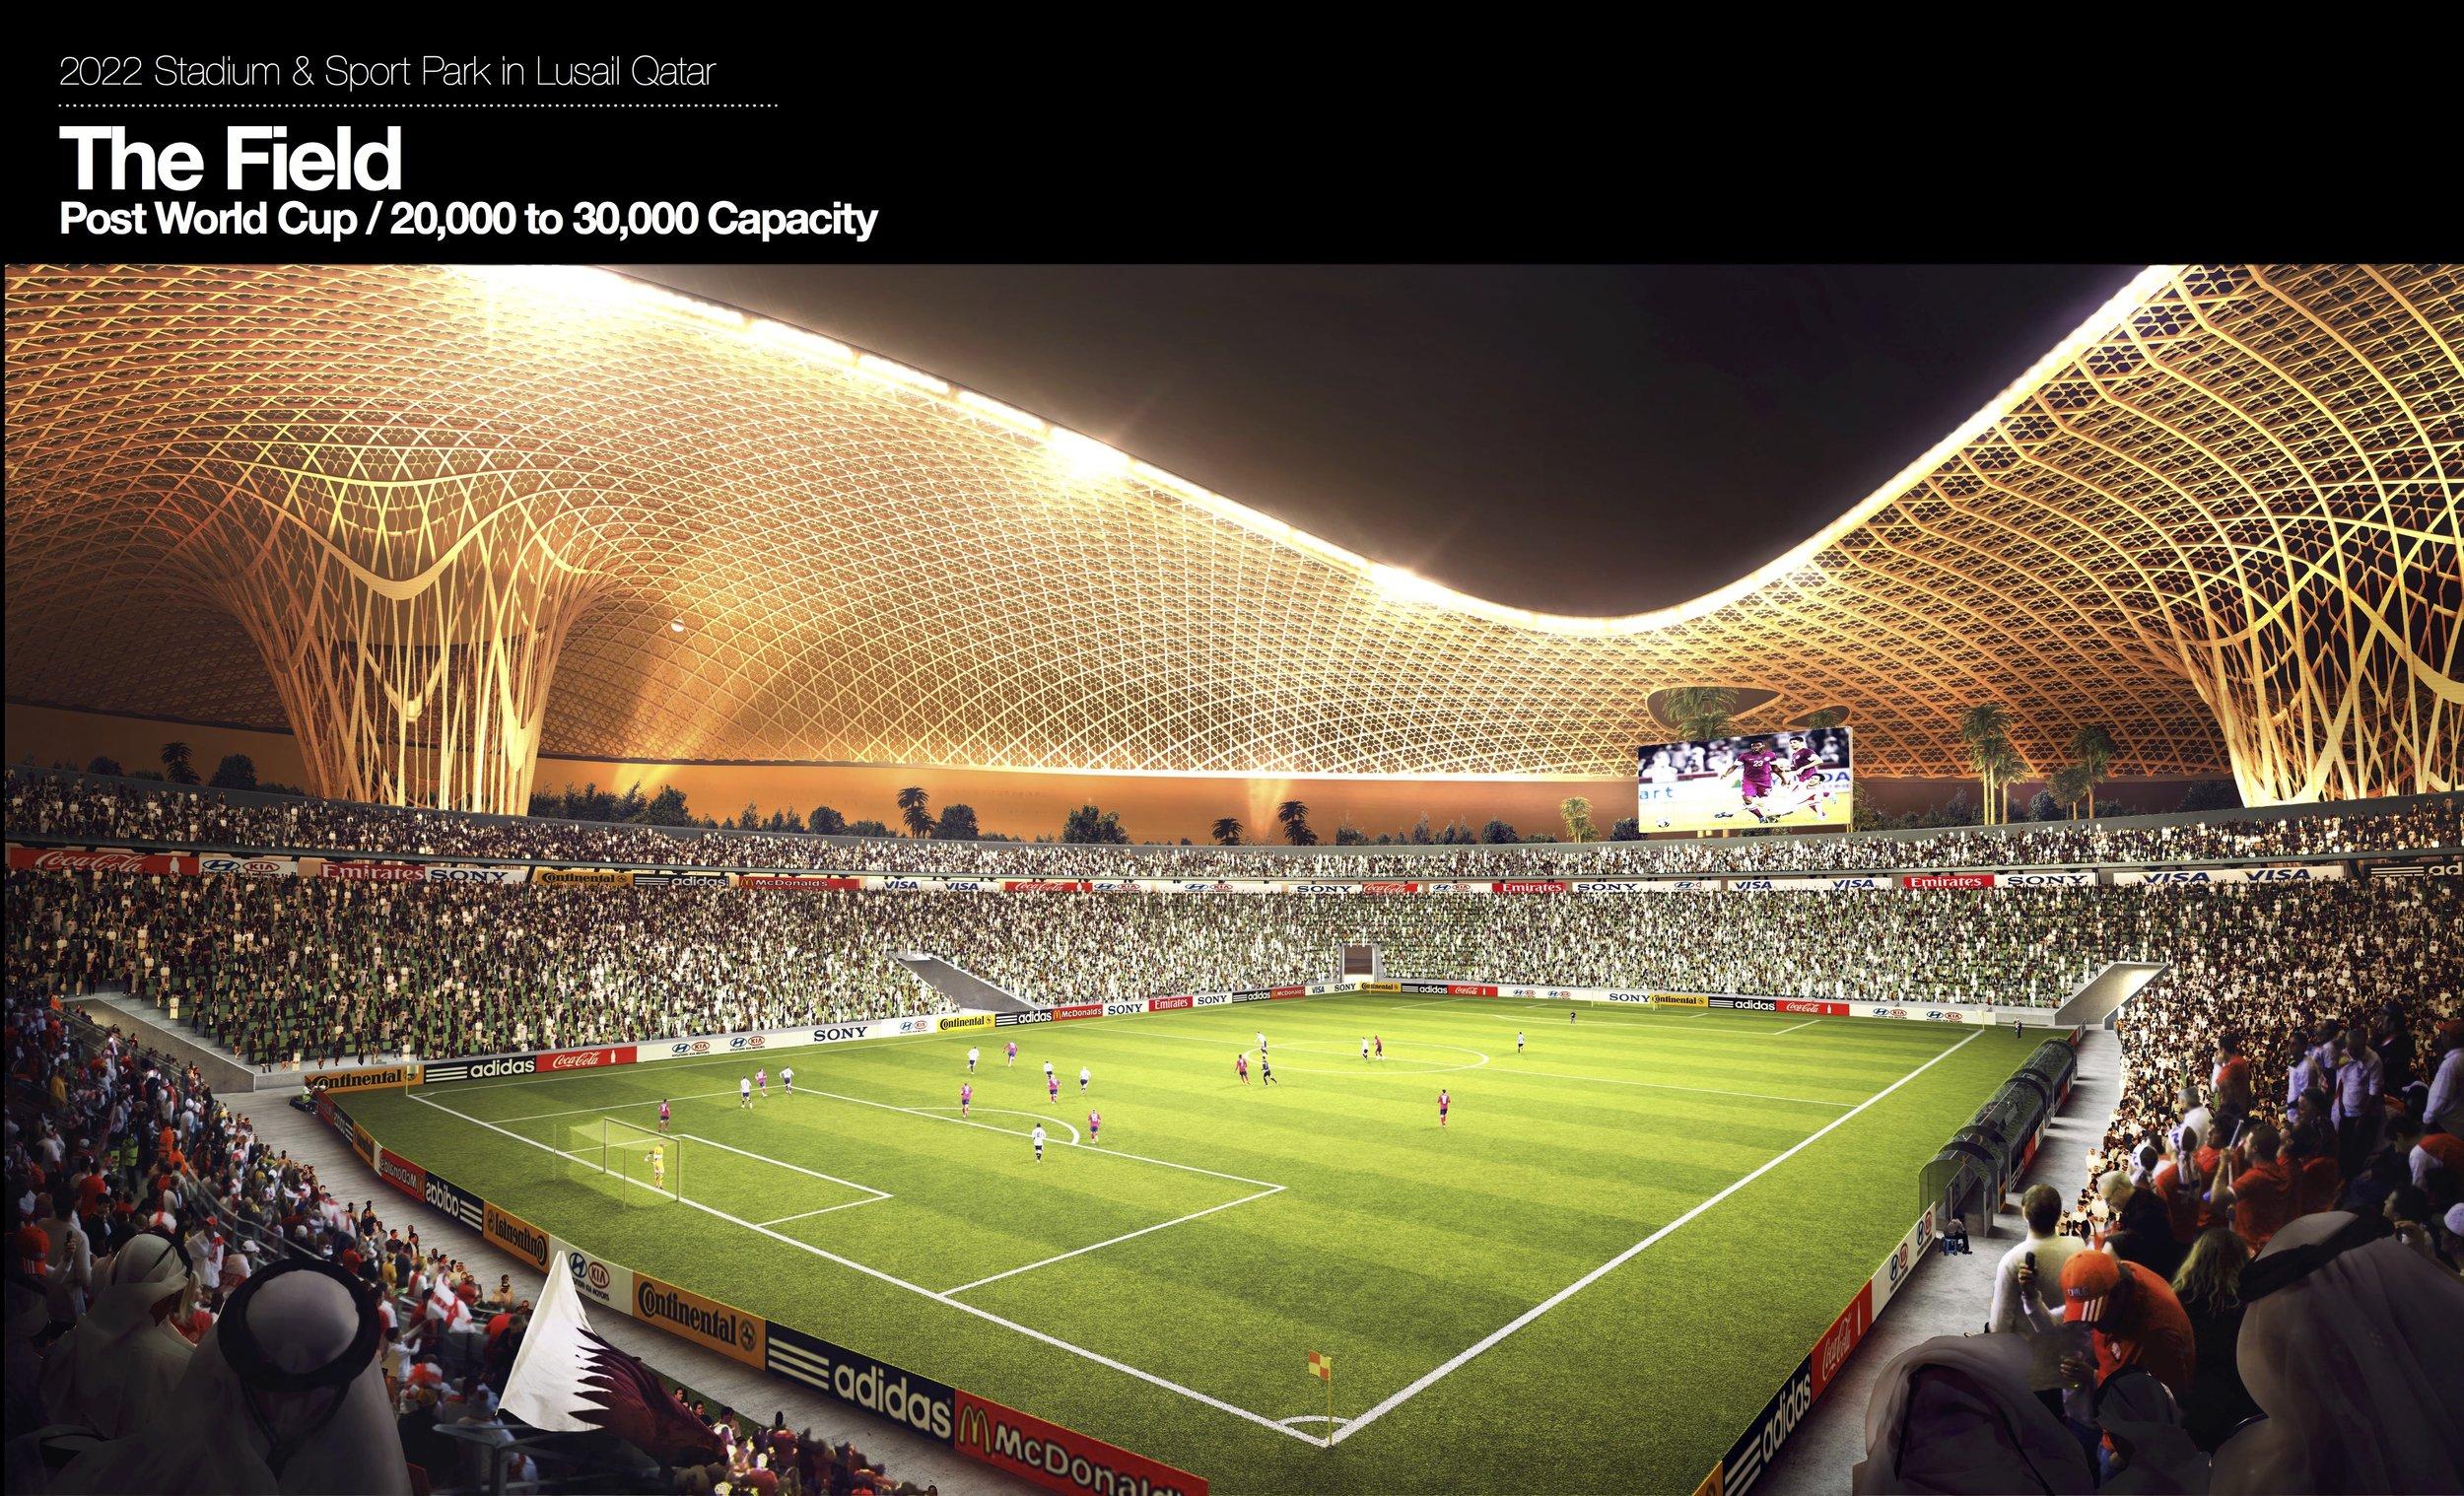 130730 Qatar_Main_Stadium_Concept_postwc interior 5.jpg